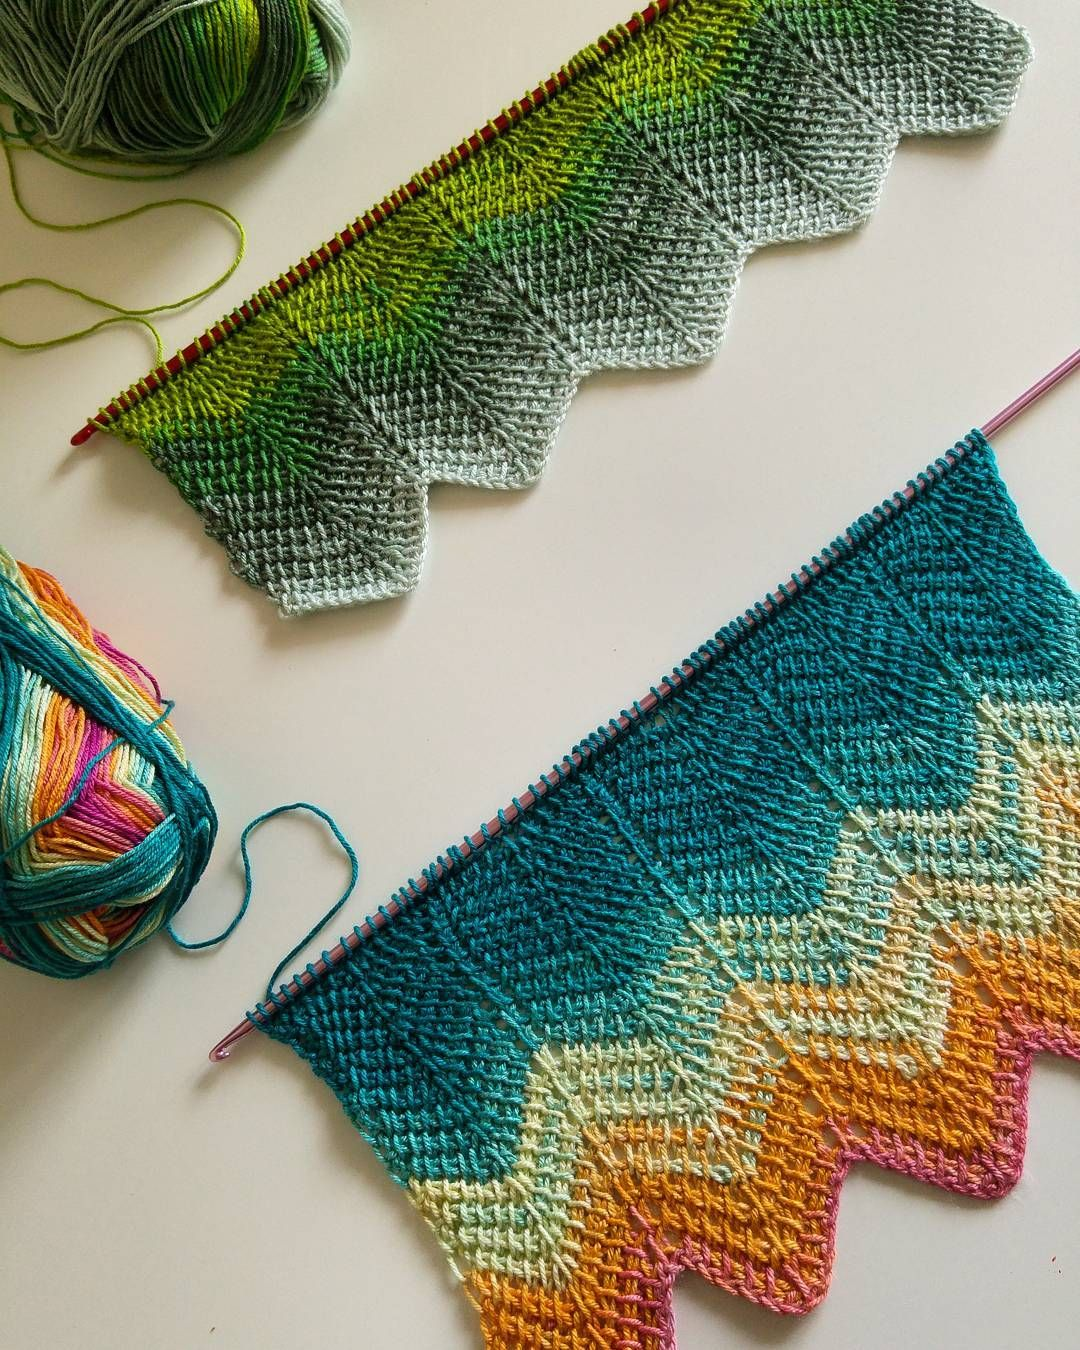 Tunus işi şal yapılışı | Ripple crochet patterns, Afghans and Blanket